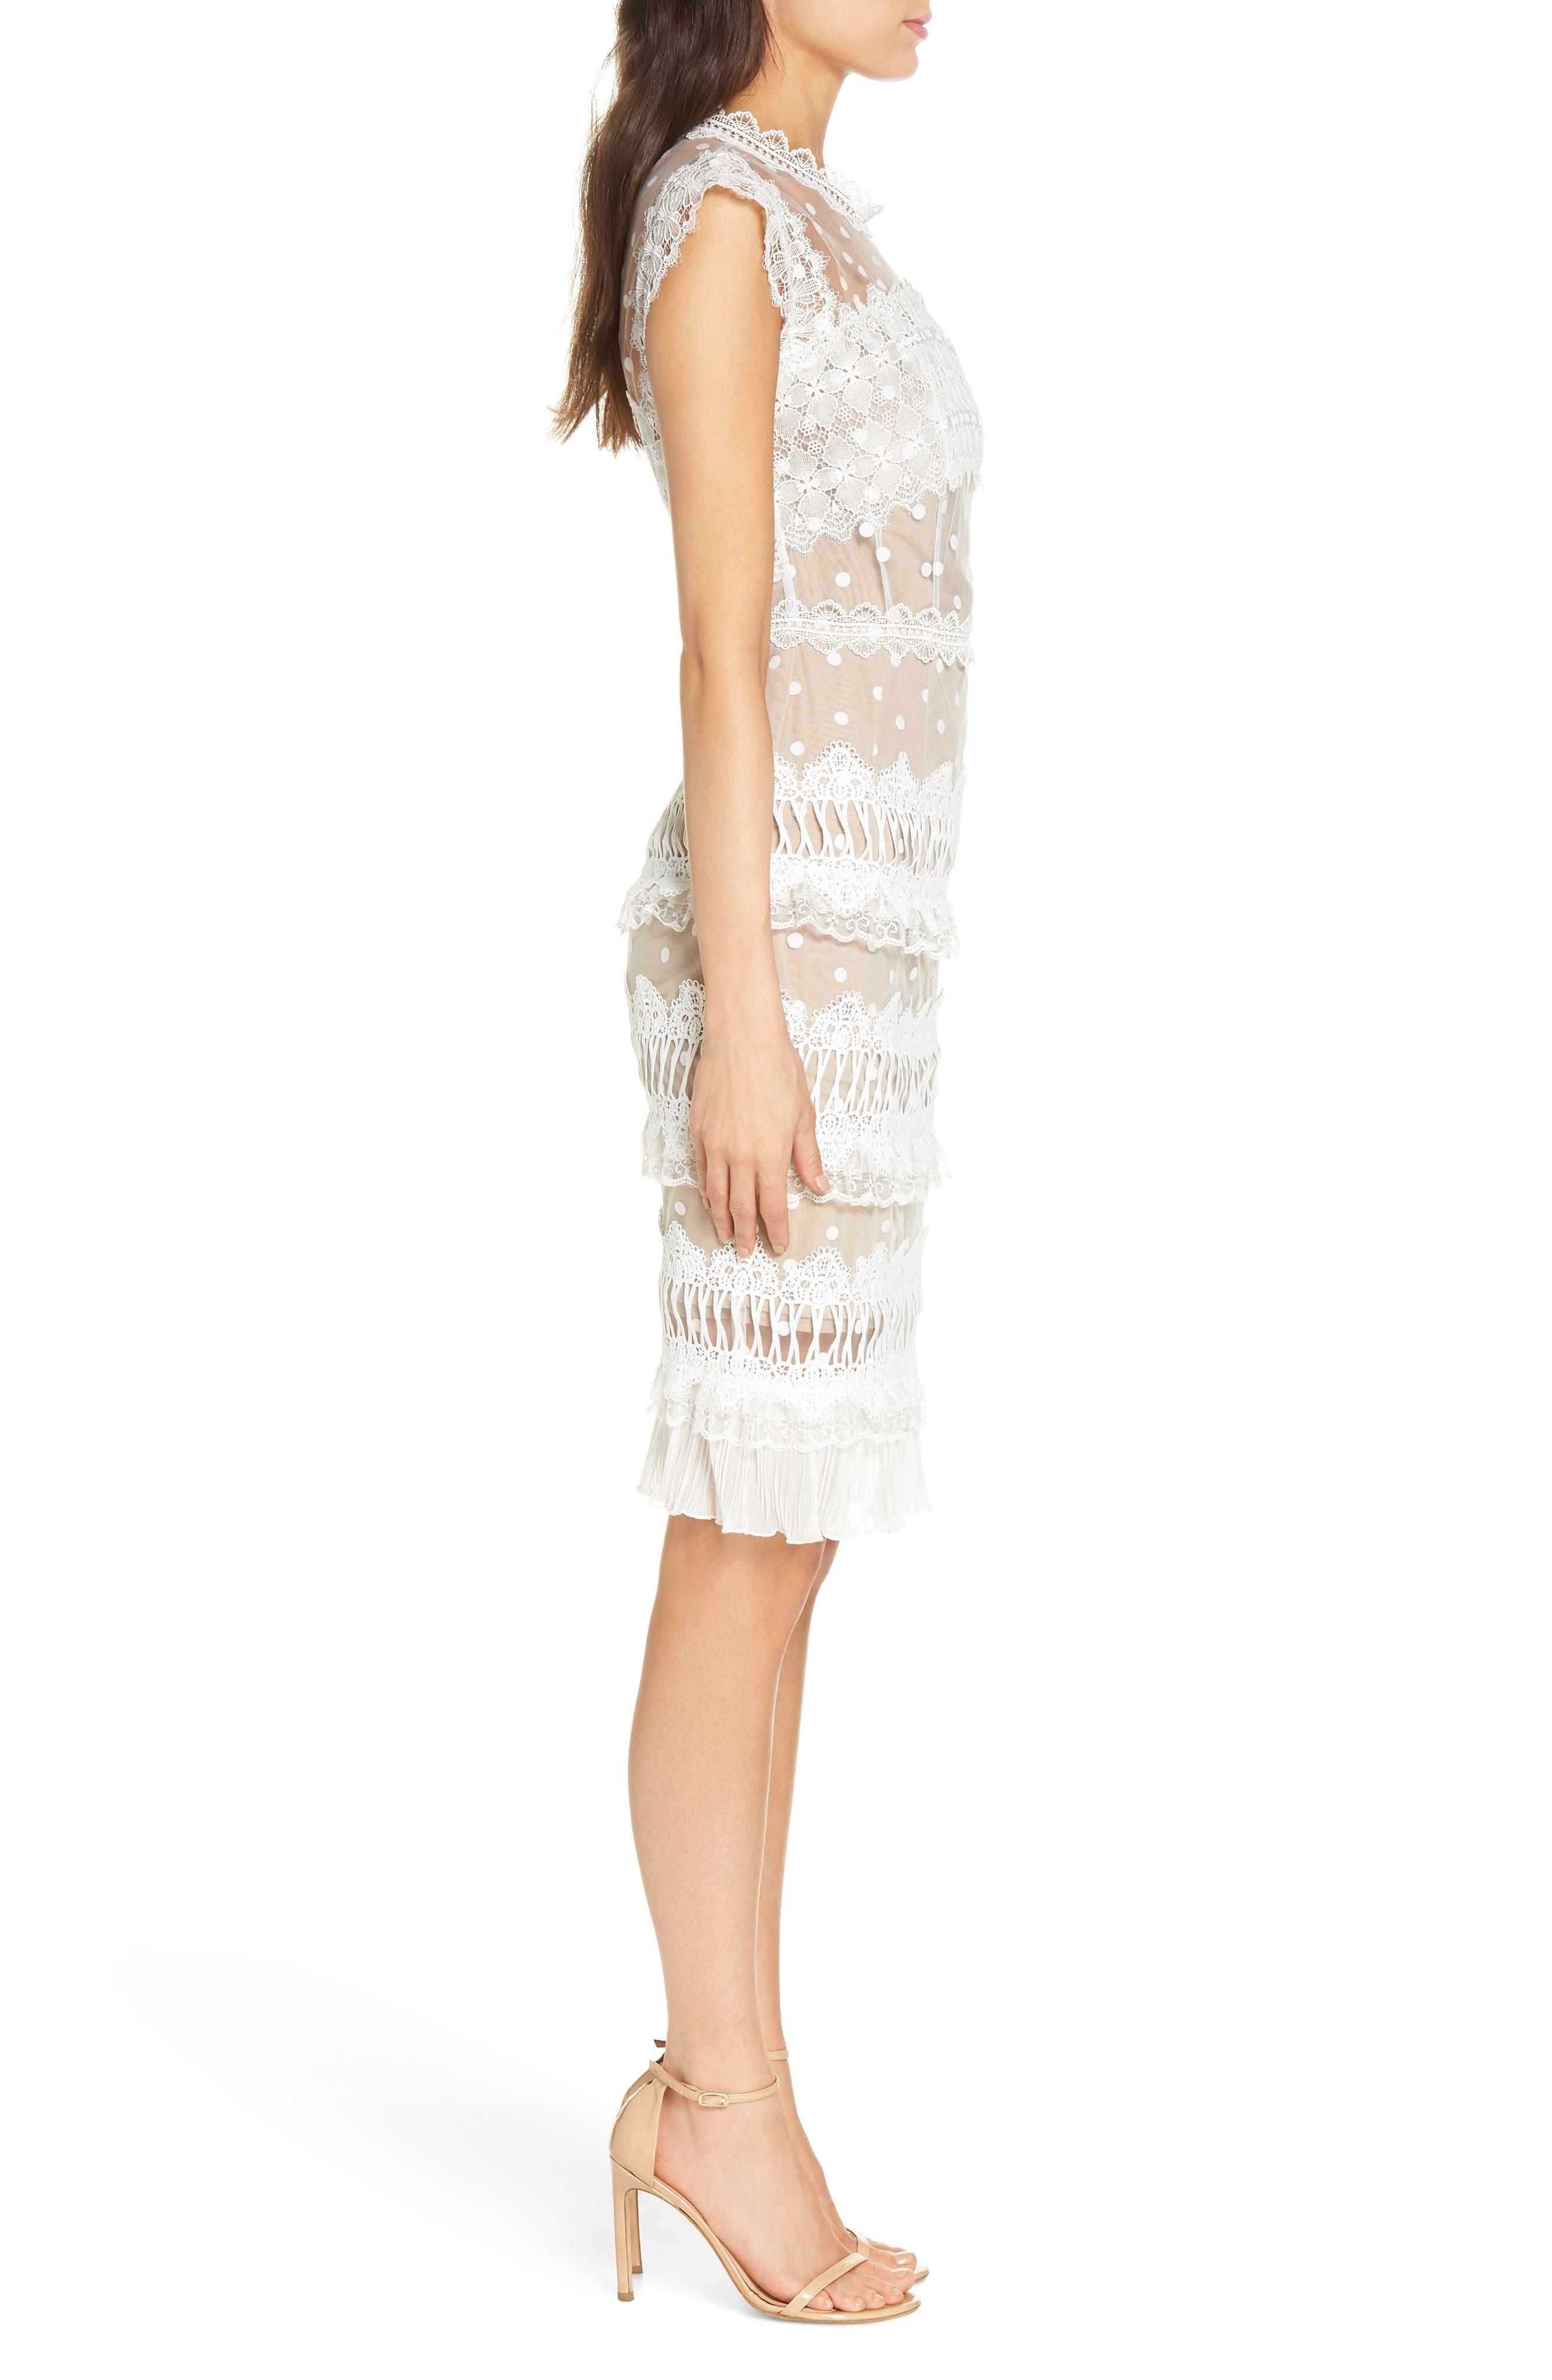 Majiorca Dot Lace Cocktail Dress,                             Alternate thumbnail 3, color,                             WHITE